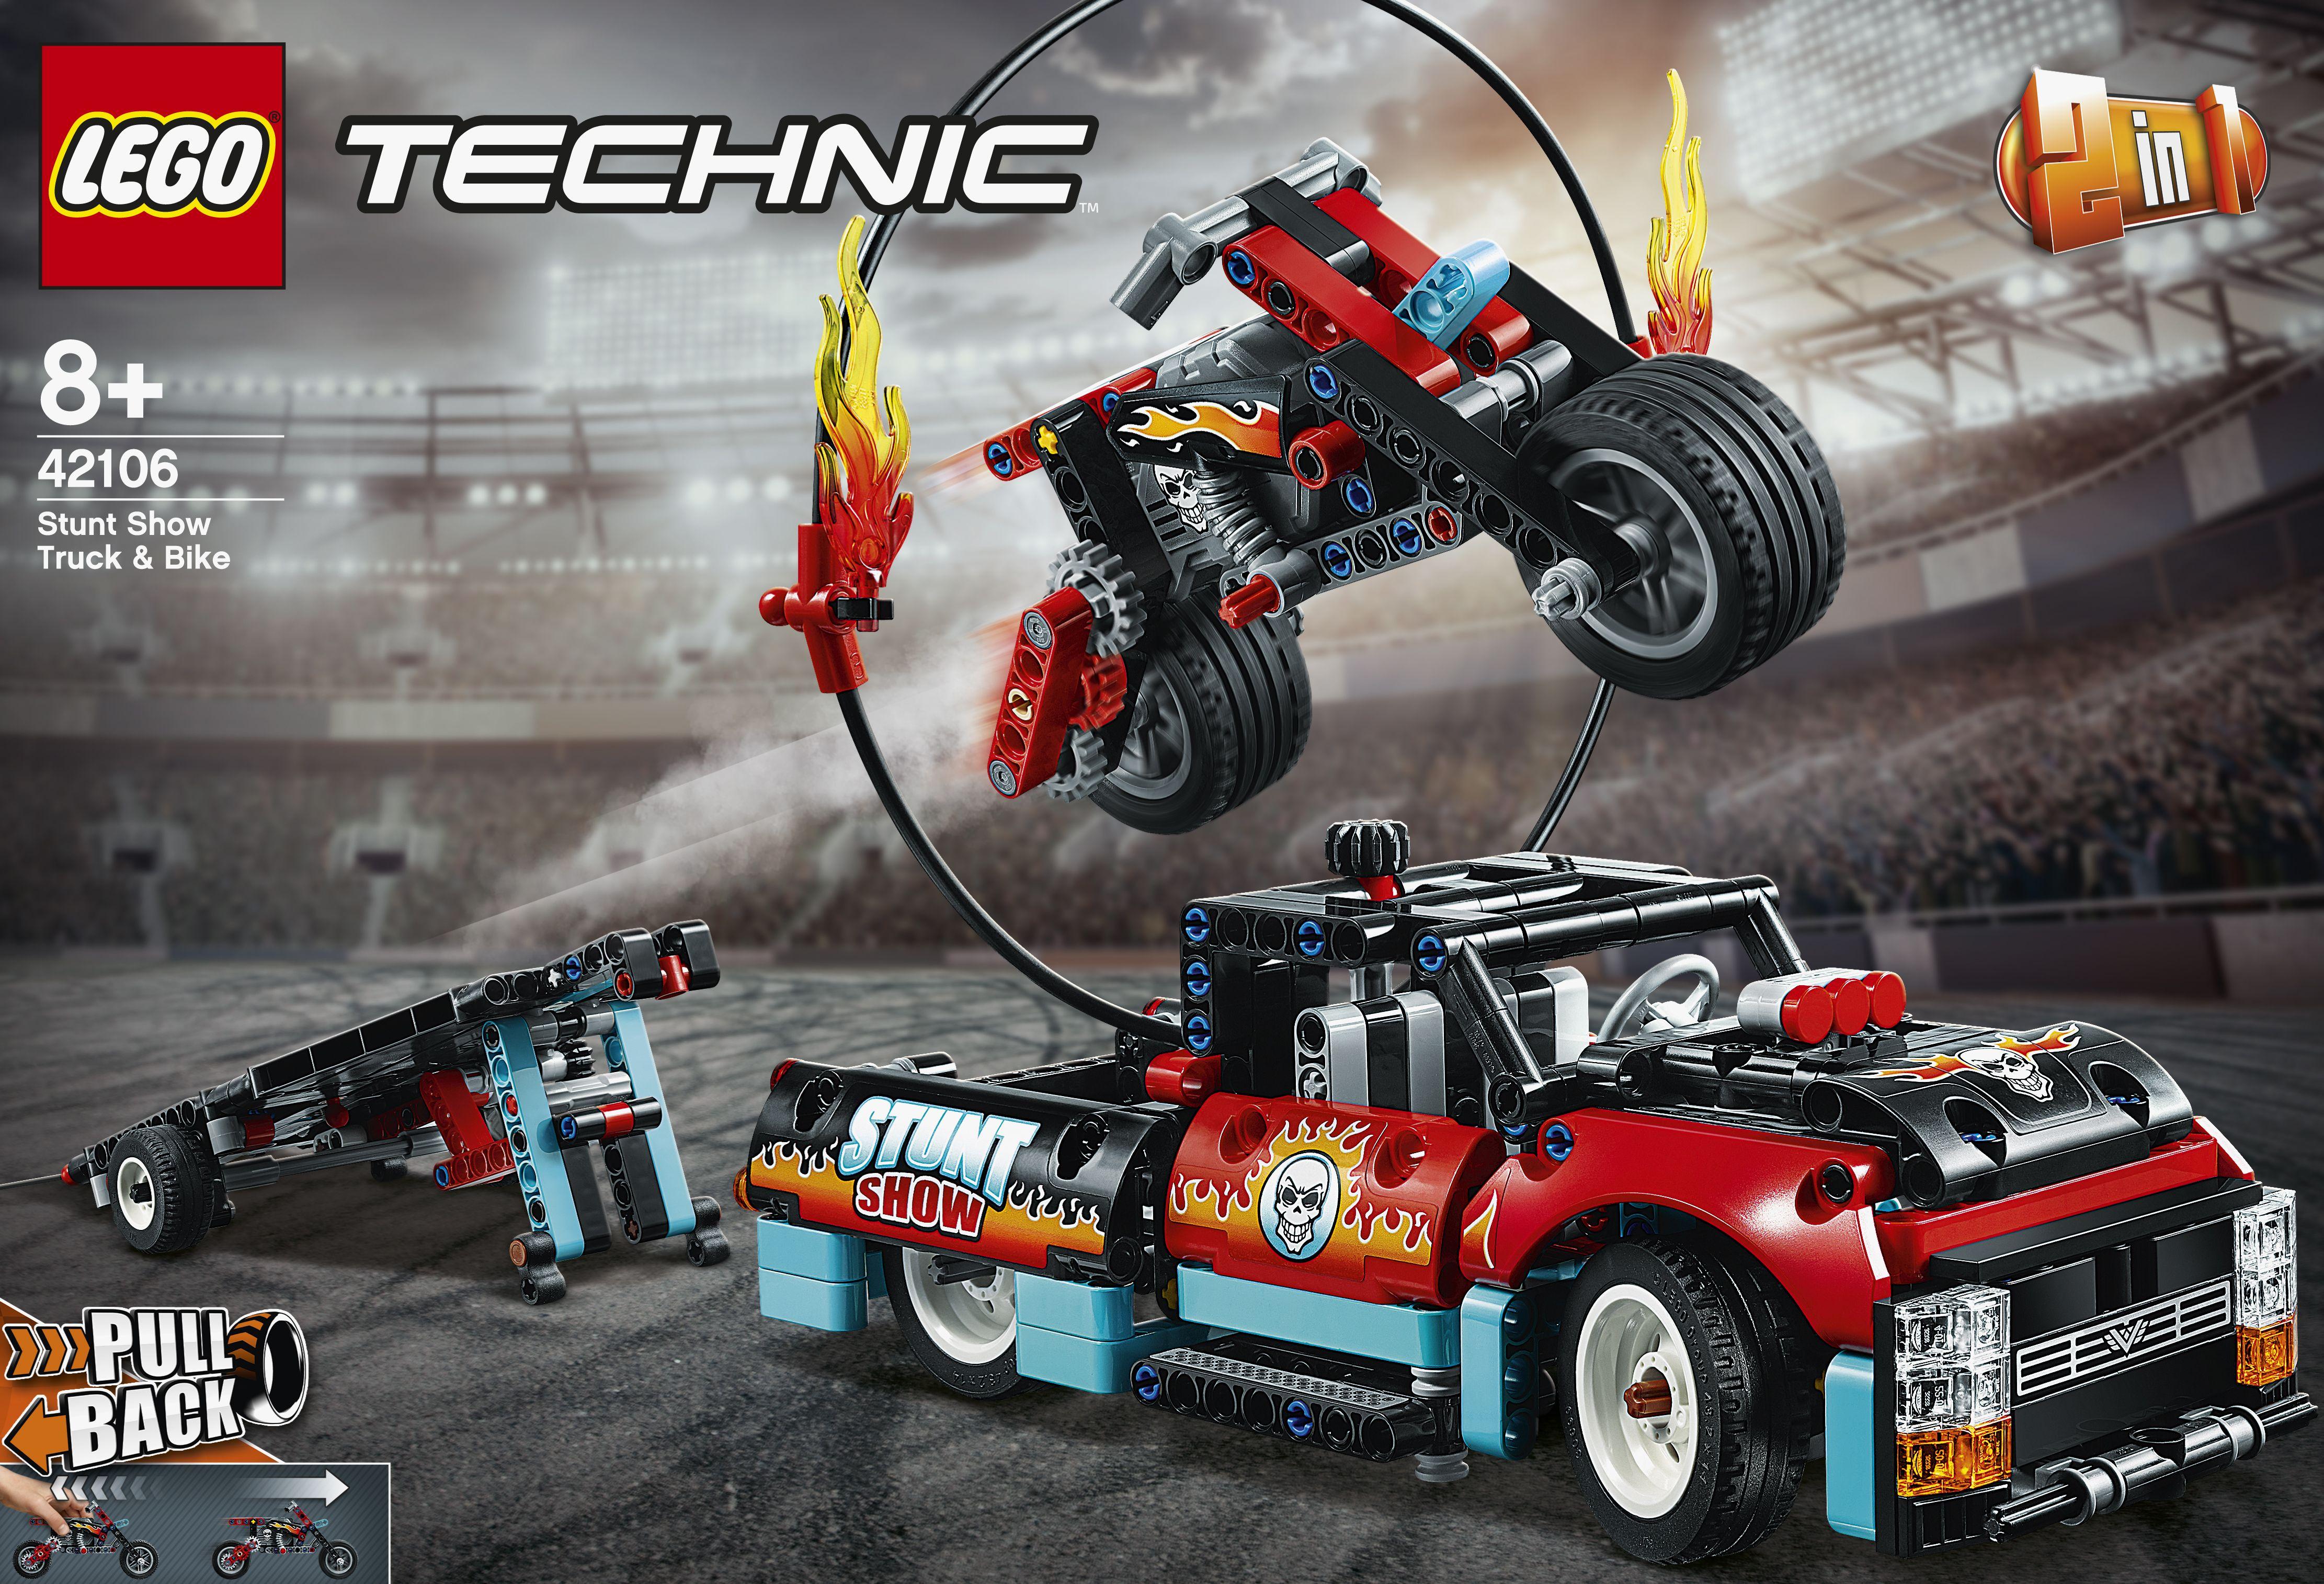 Lego Technic Neuheiten 2020 In 2020 Lego Technic Lego Technic Truck Lego Technic Sets